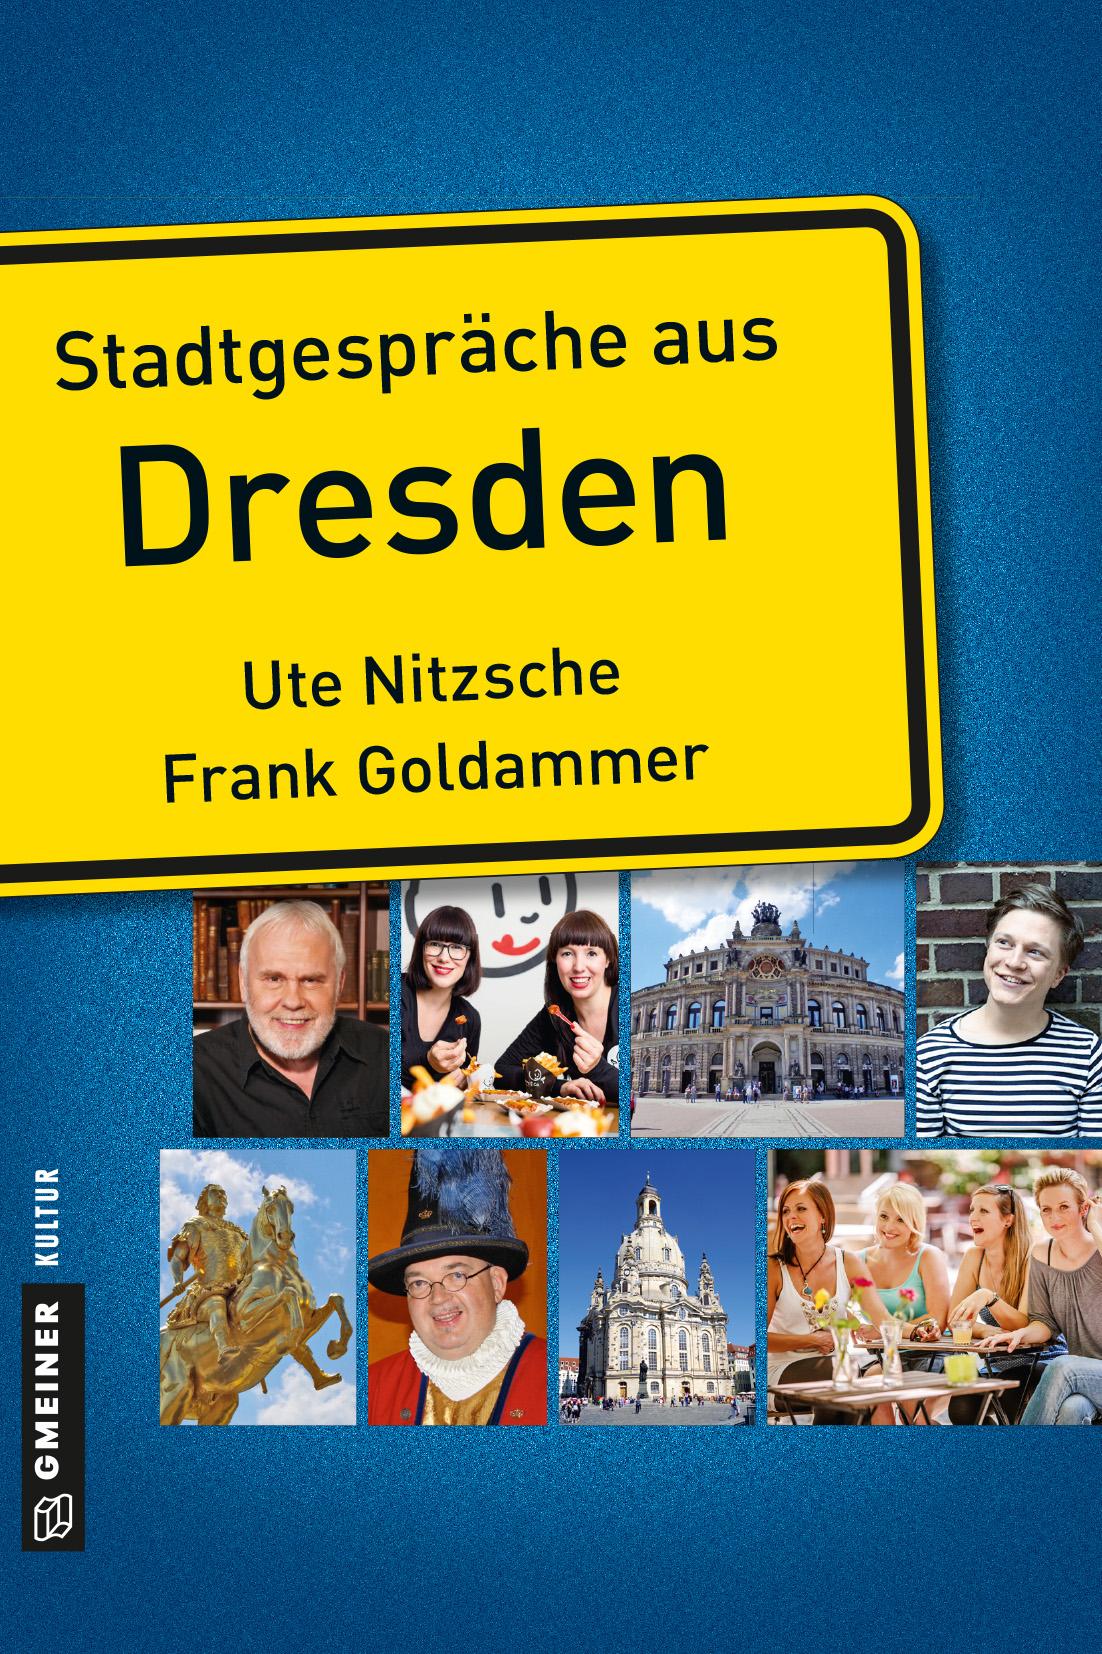 Stadtgespraeche-aus-Dresden